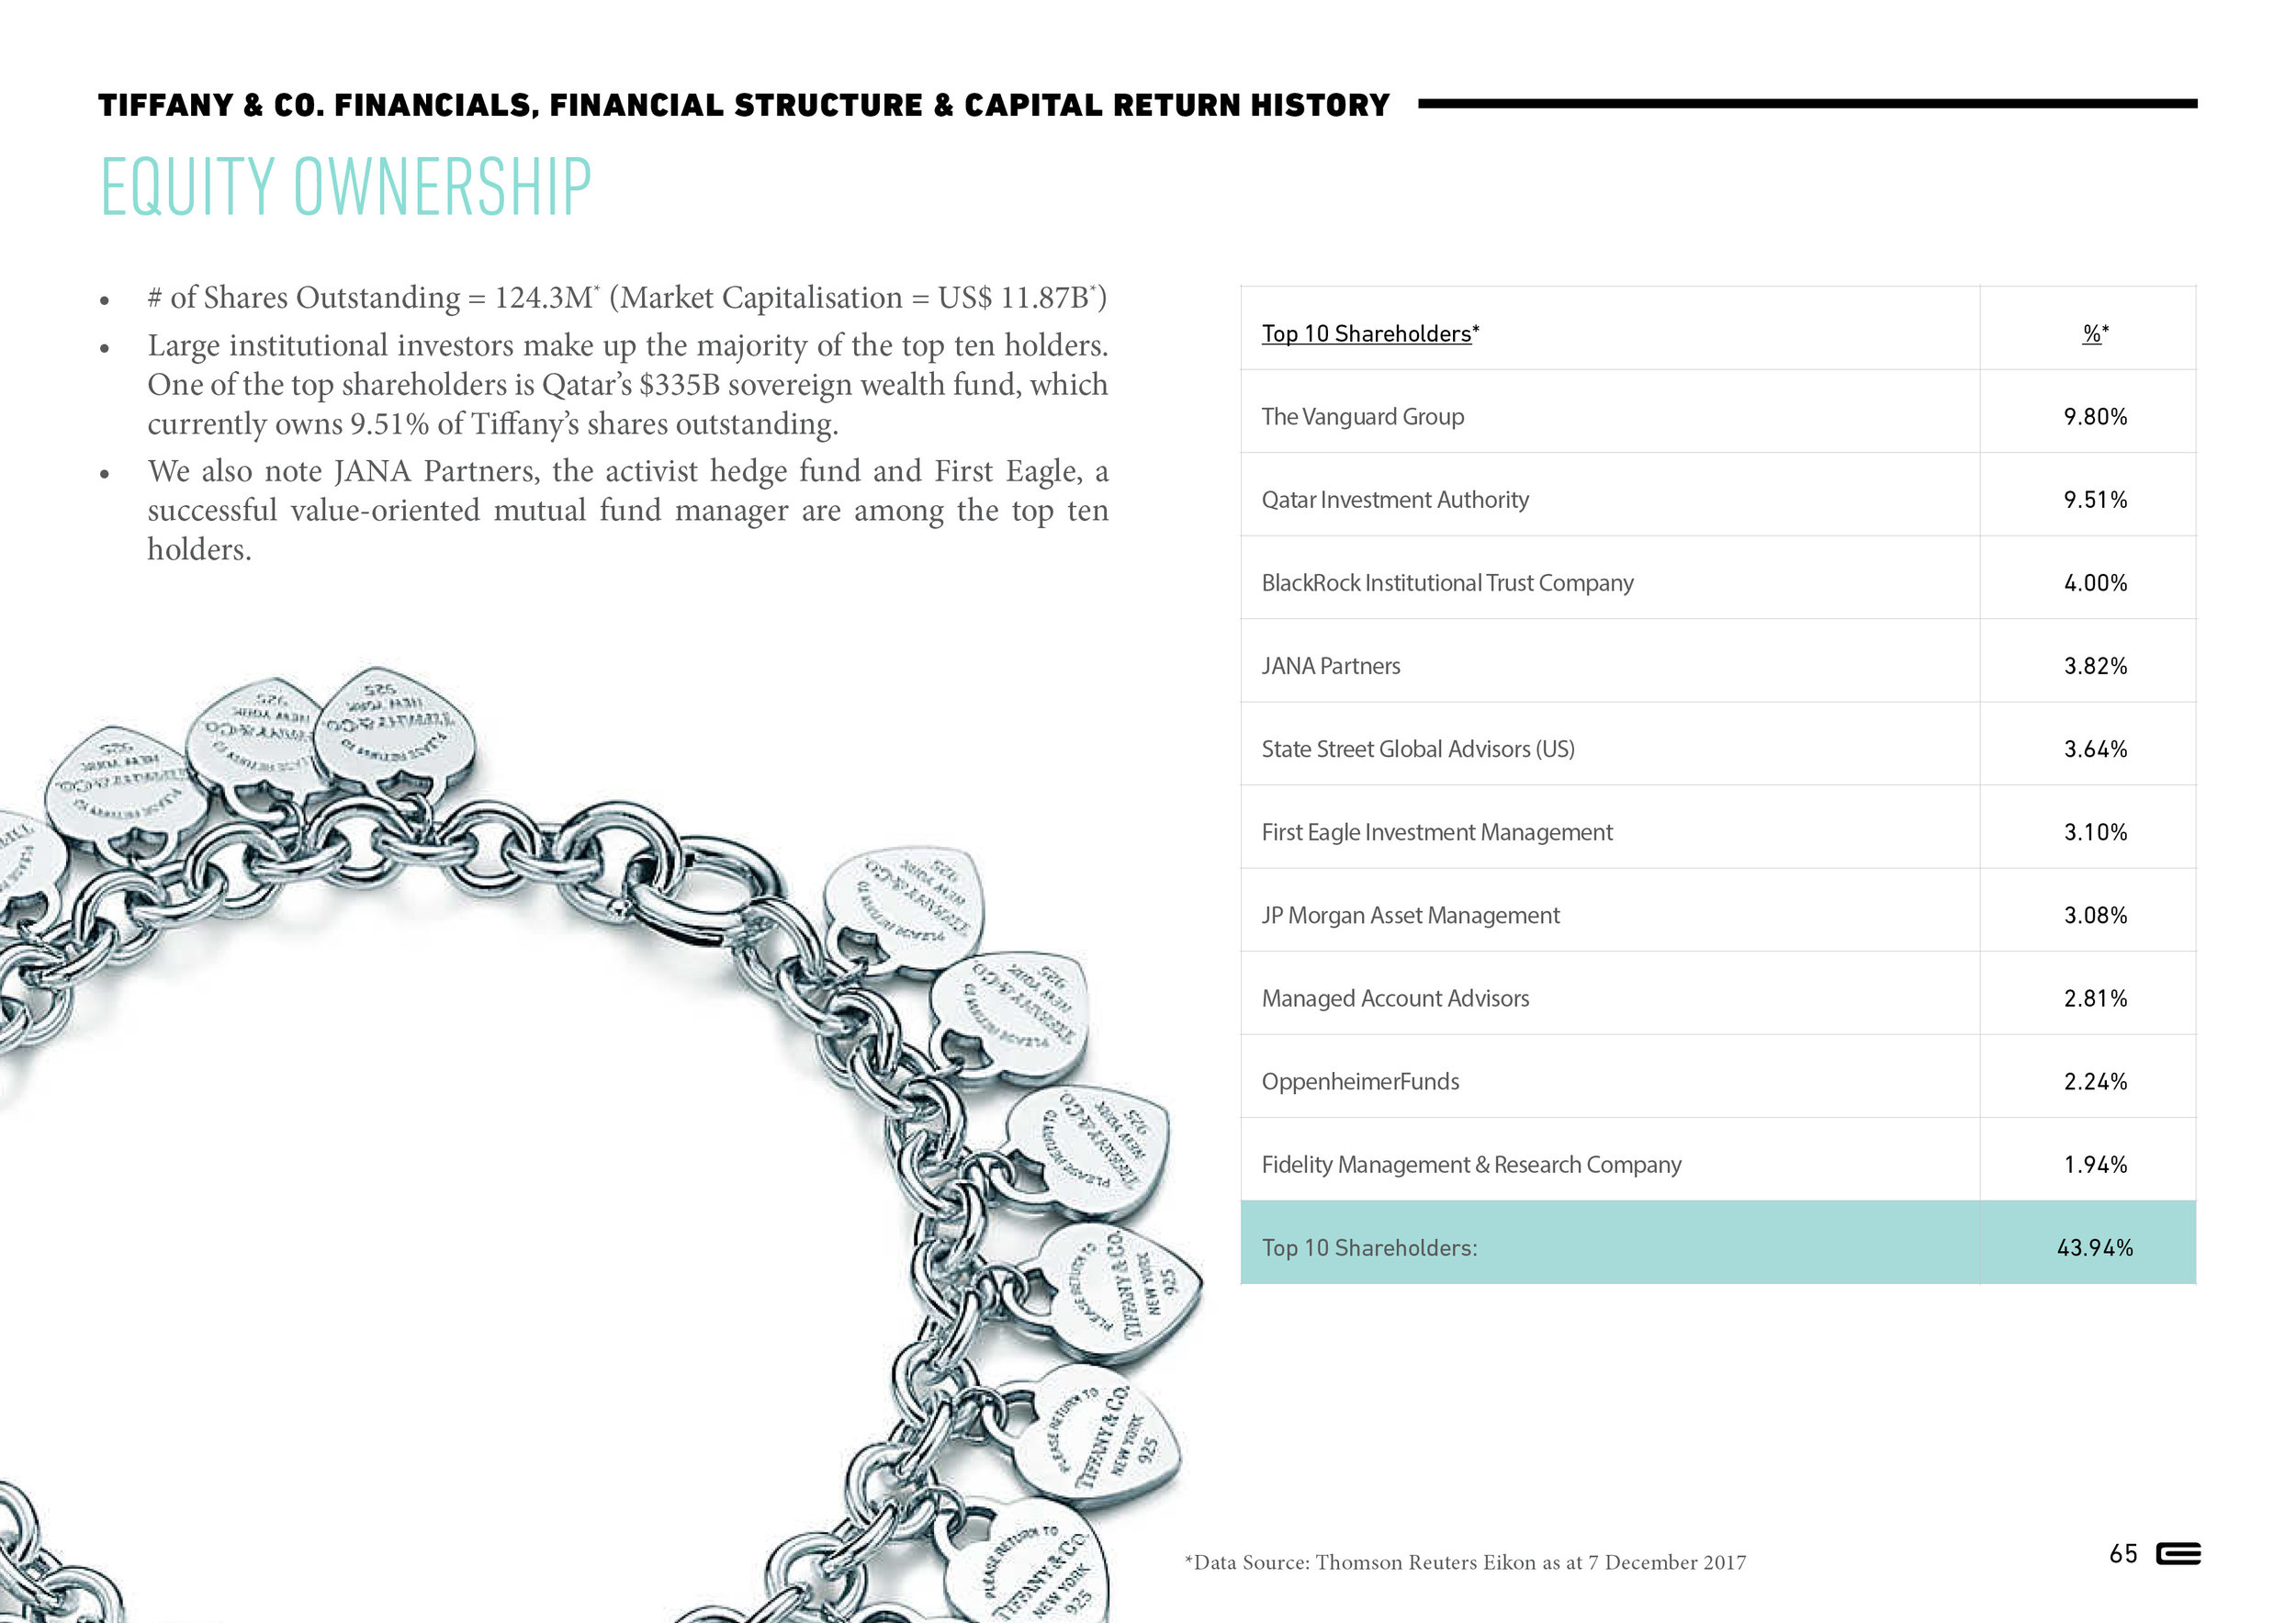 EC - VIC 2018 Presentation on Tiffany65.jpg